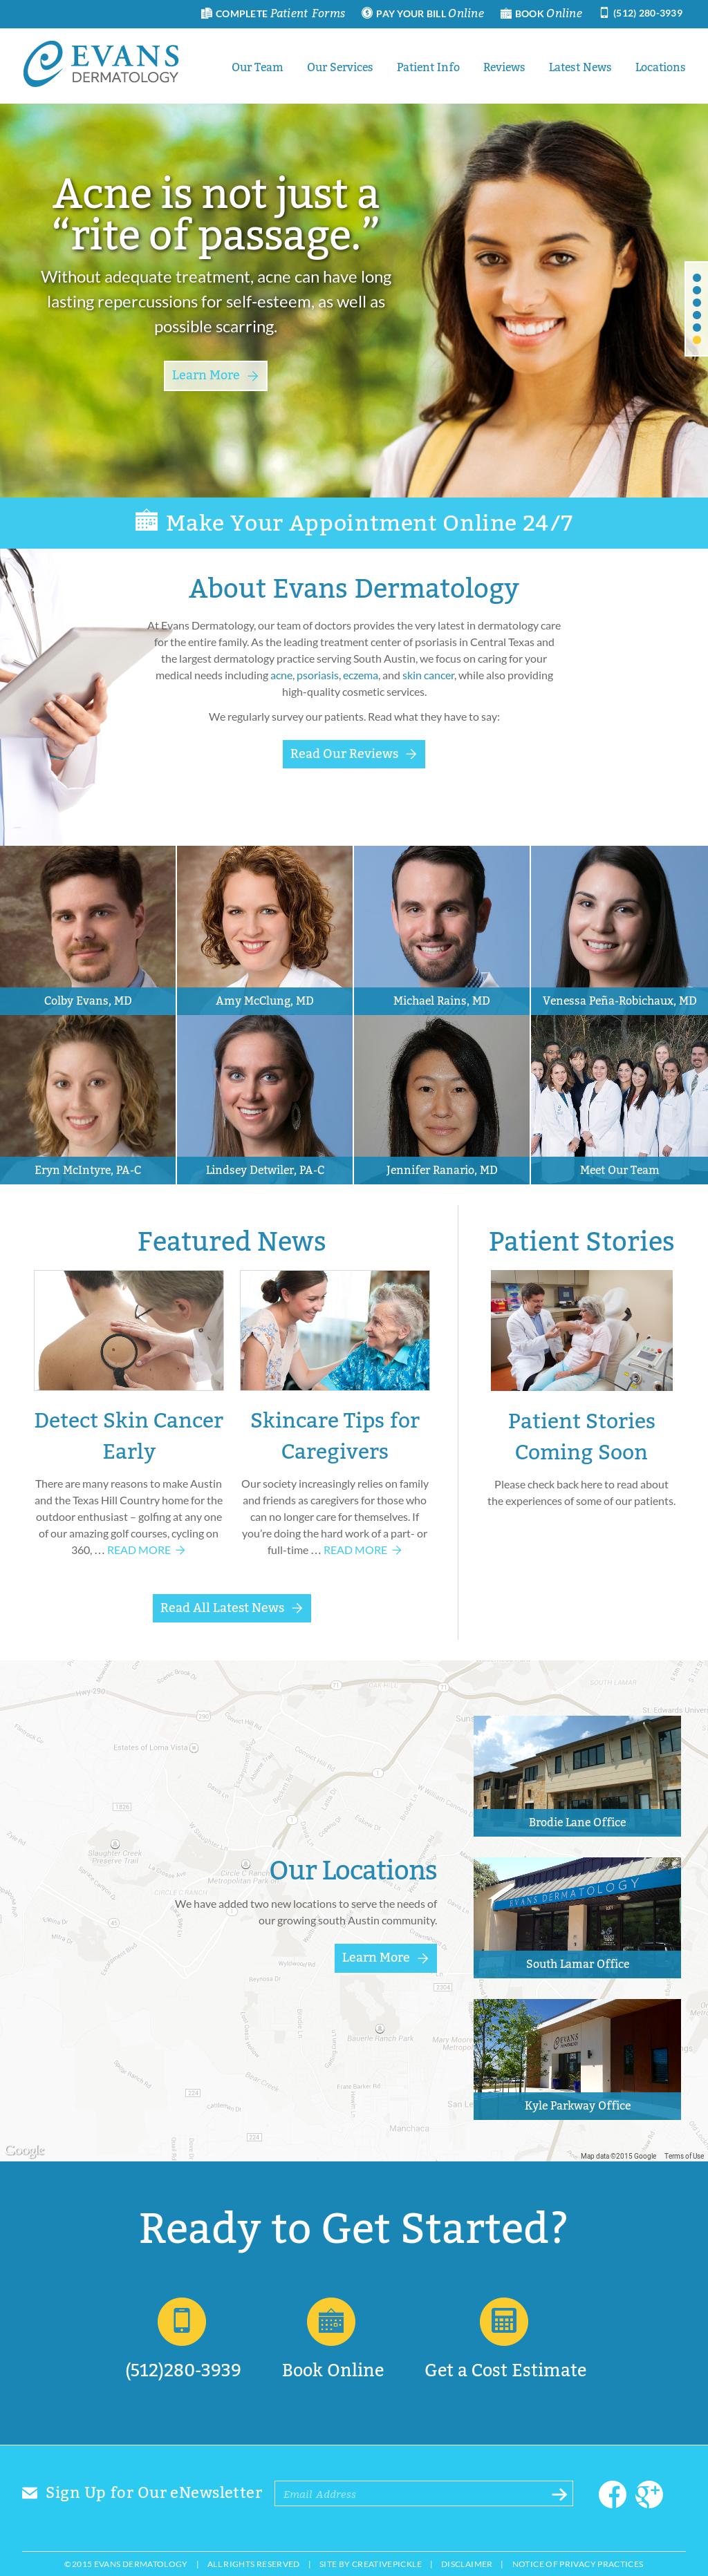 Evans Dermatology Partners Competitors, Revenue and